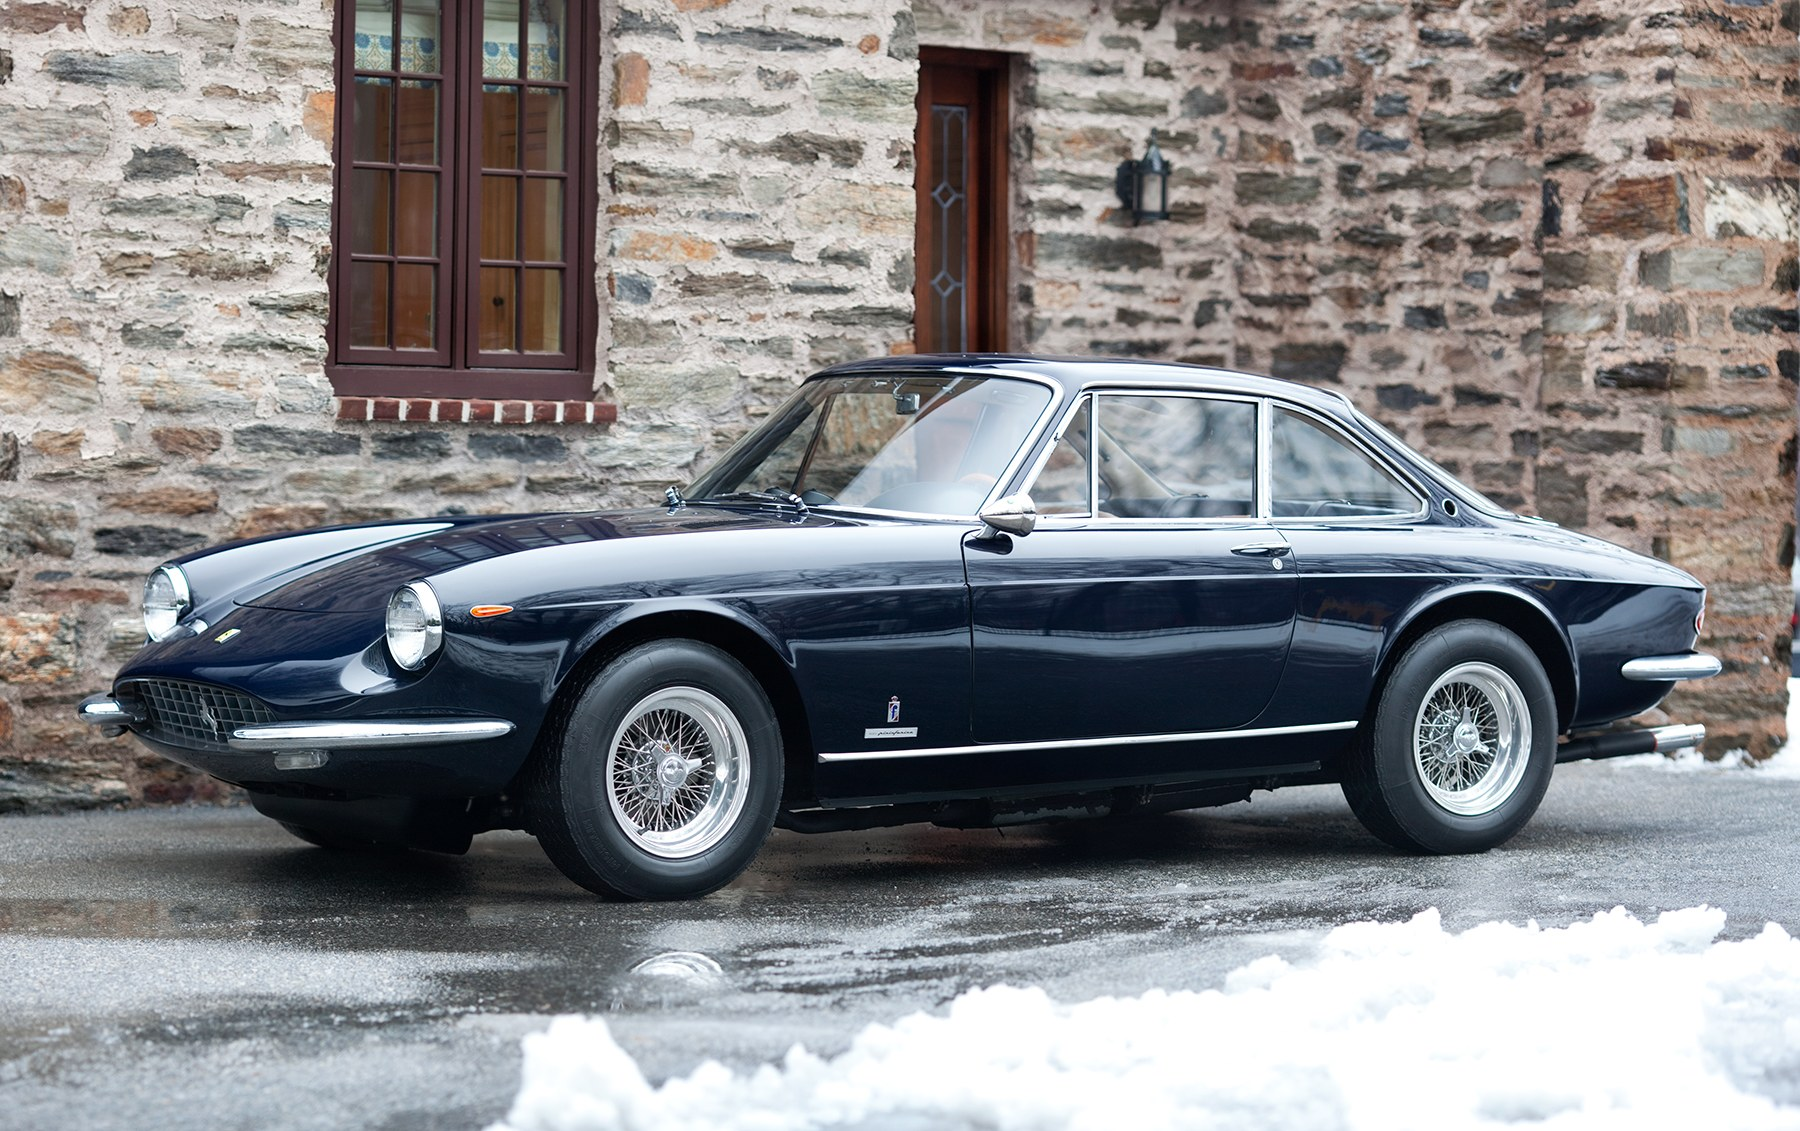 1969 Ferrari 365 GTC (1)